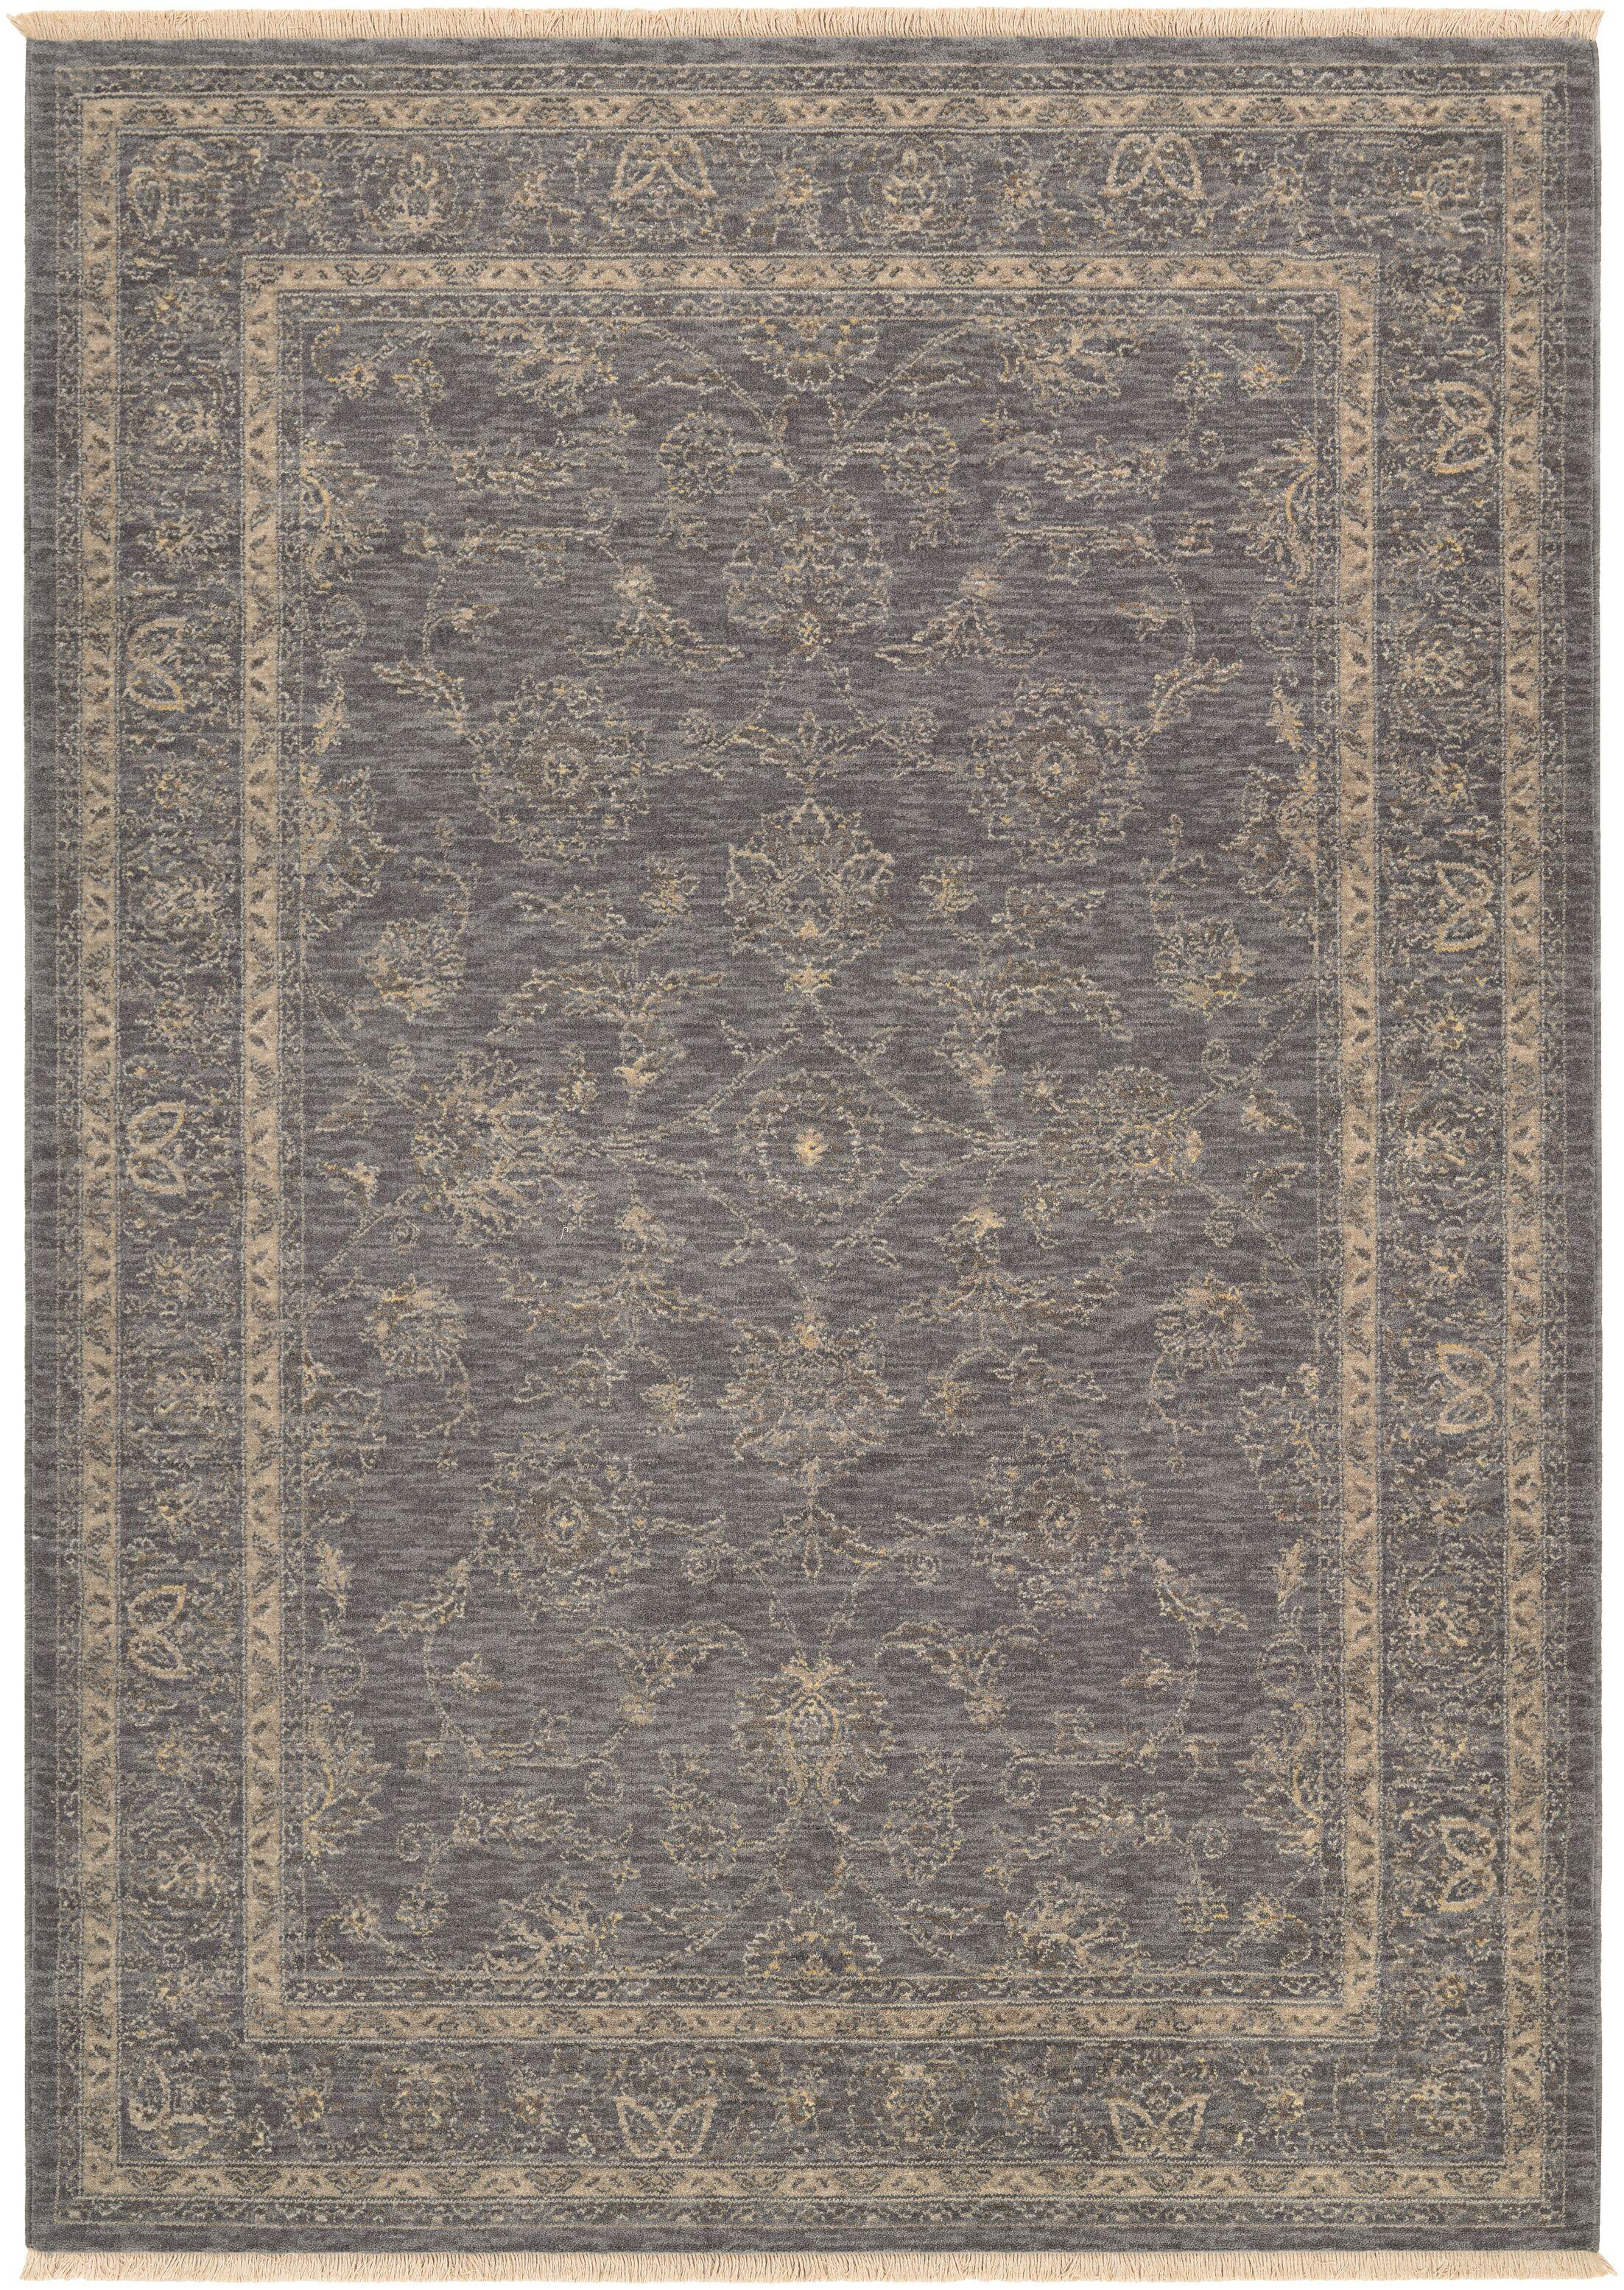 Nickalos Dusty Blue/Beige Area Rug Rug Size: Rectangle 9'10